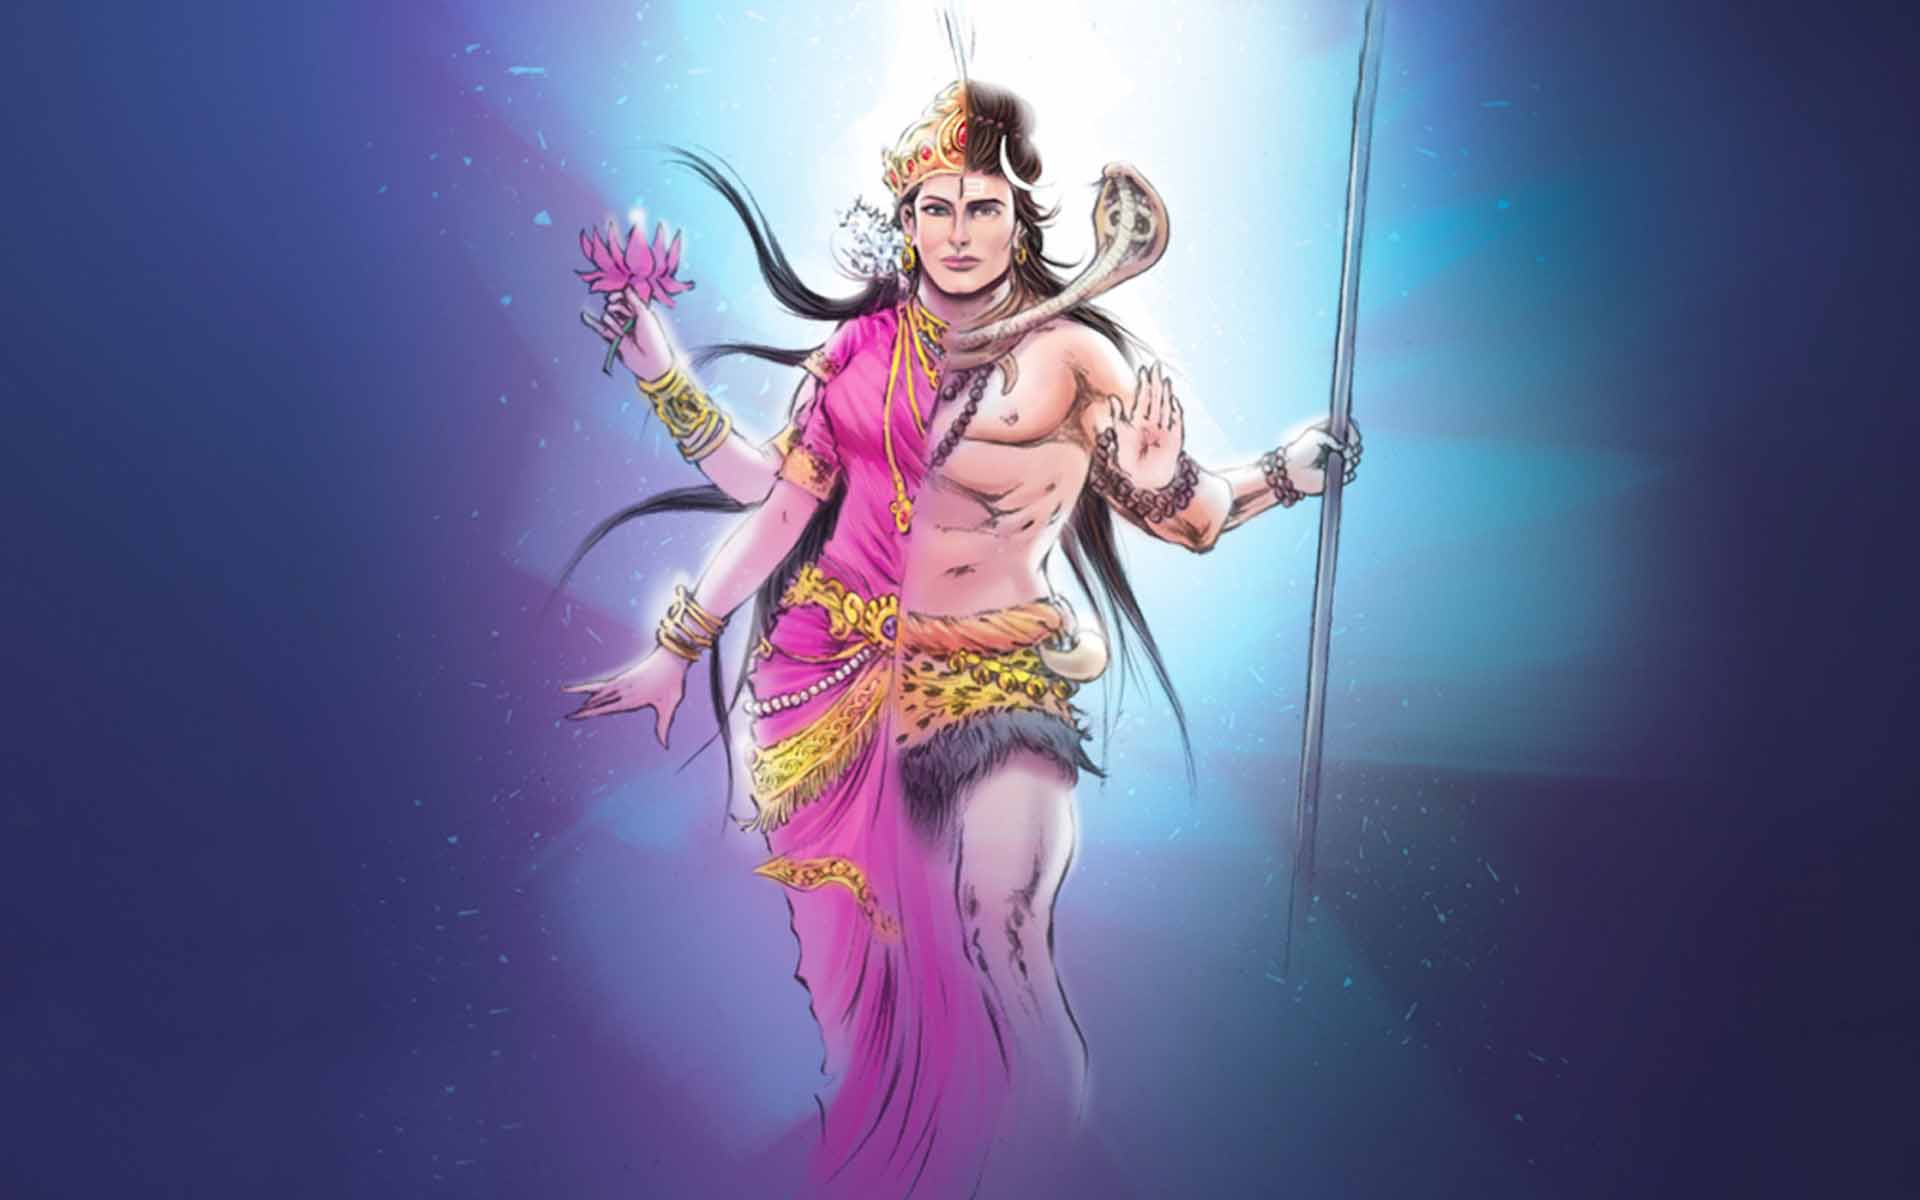 Full hd image of god shivan